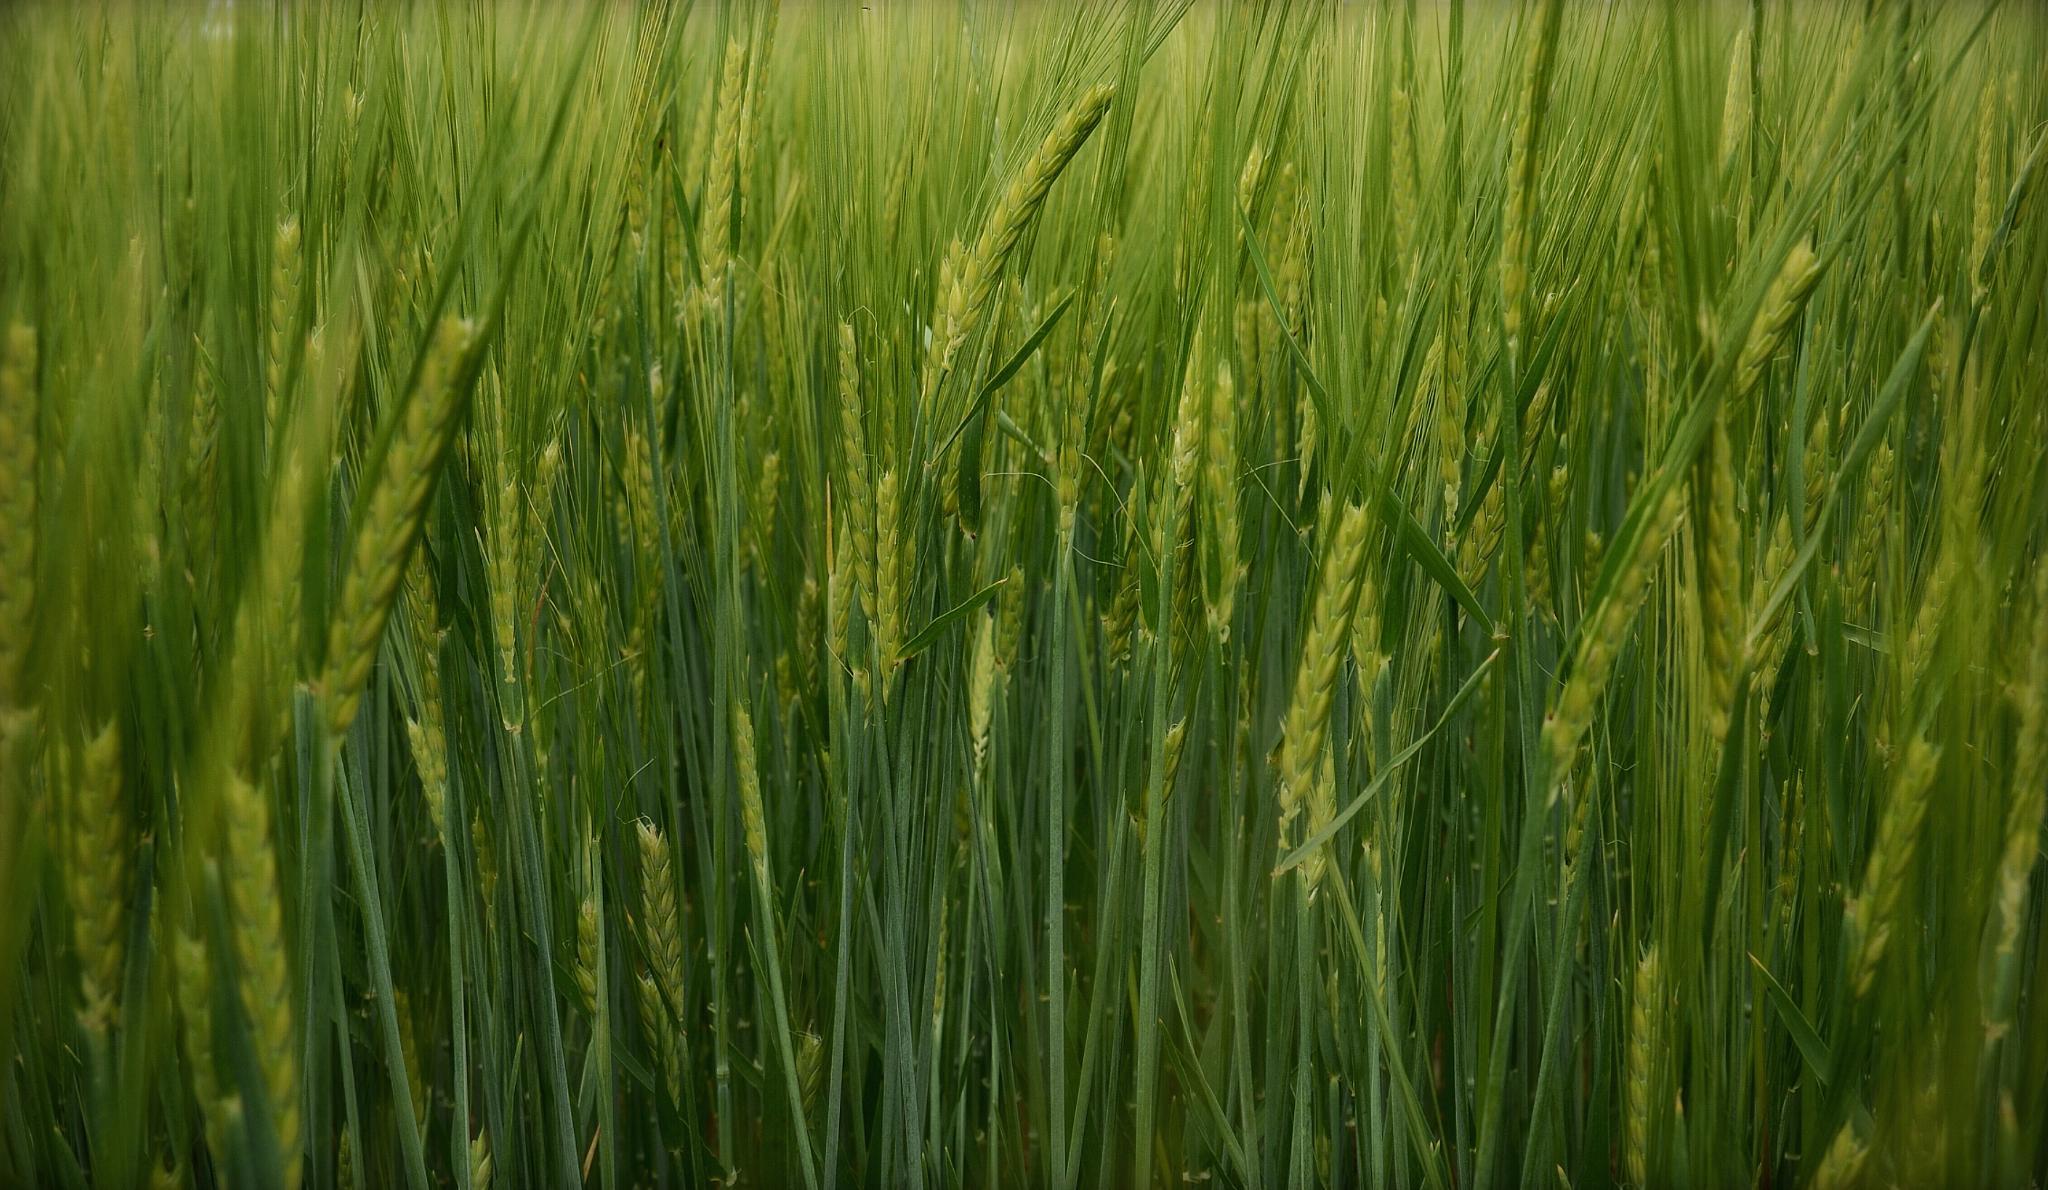 Green Wheat by David J. Julián